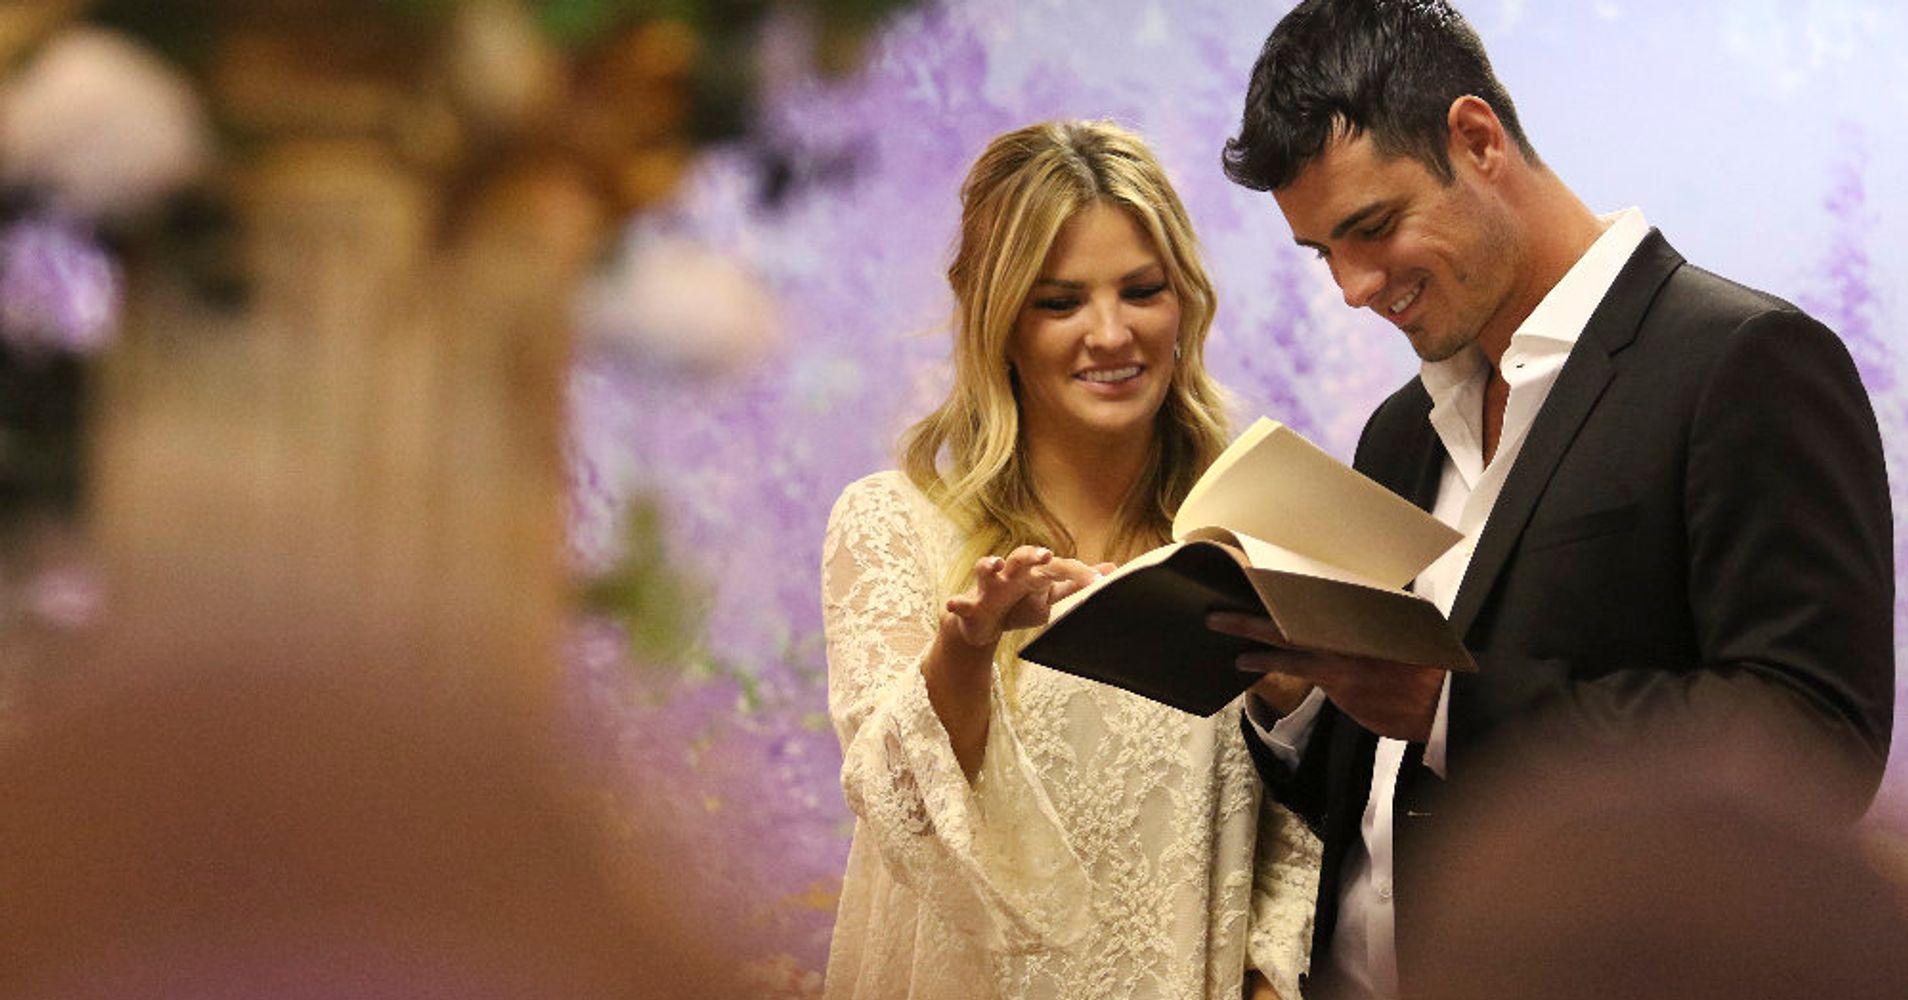 'The Bachelor' Season 20 Episode 4 Recap: What Happens In